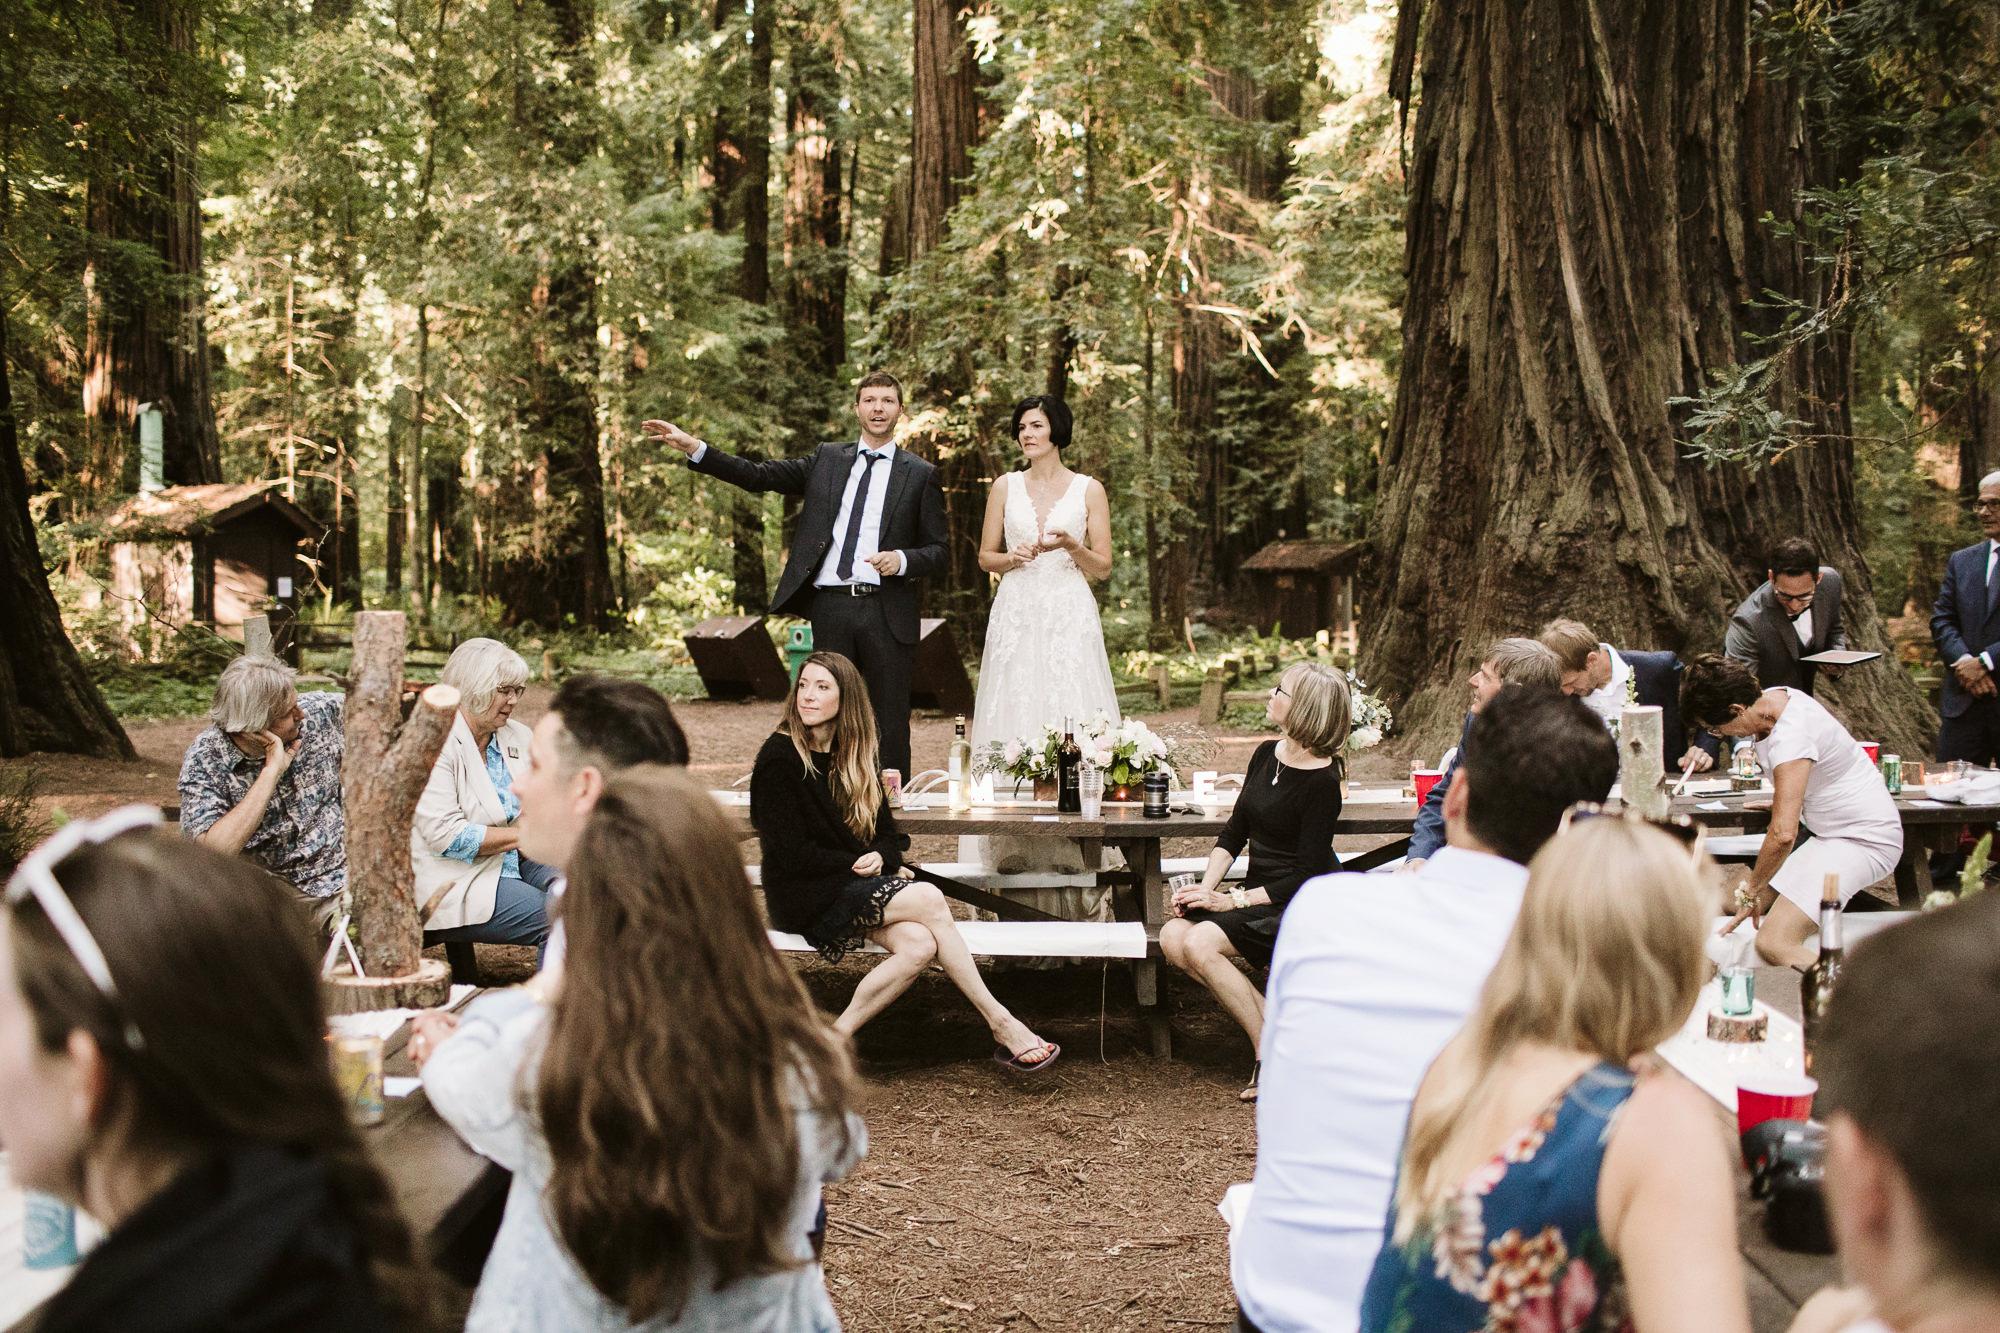 California-wedding-photographer-alfonso-flores-pamplin-groove-309.jpg